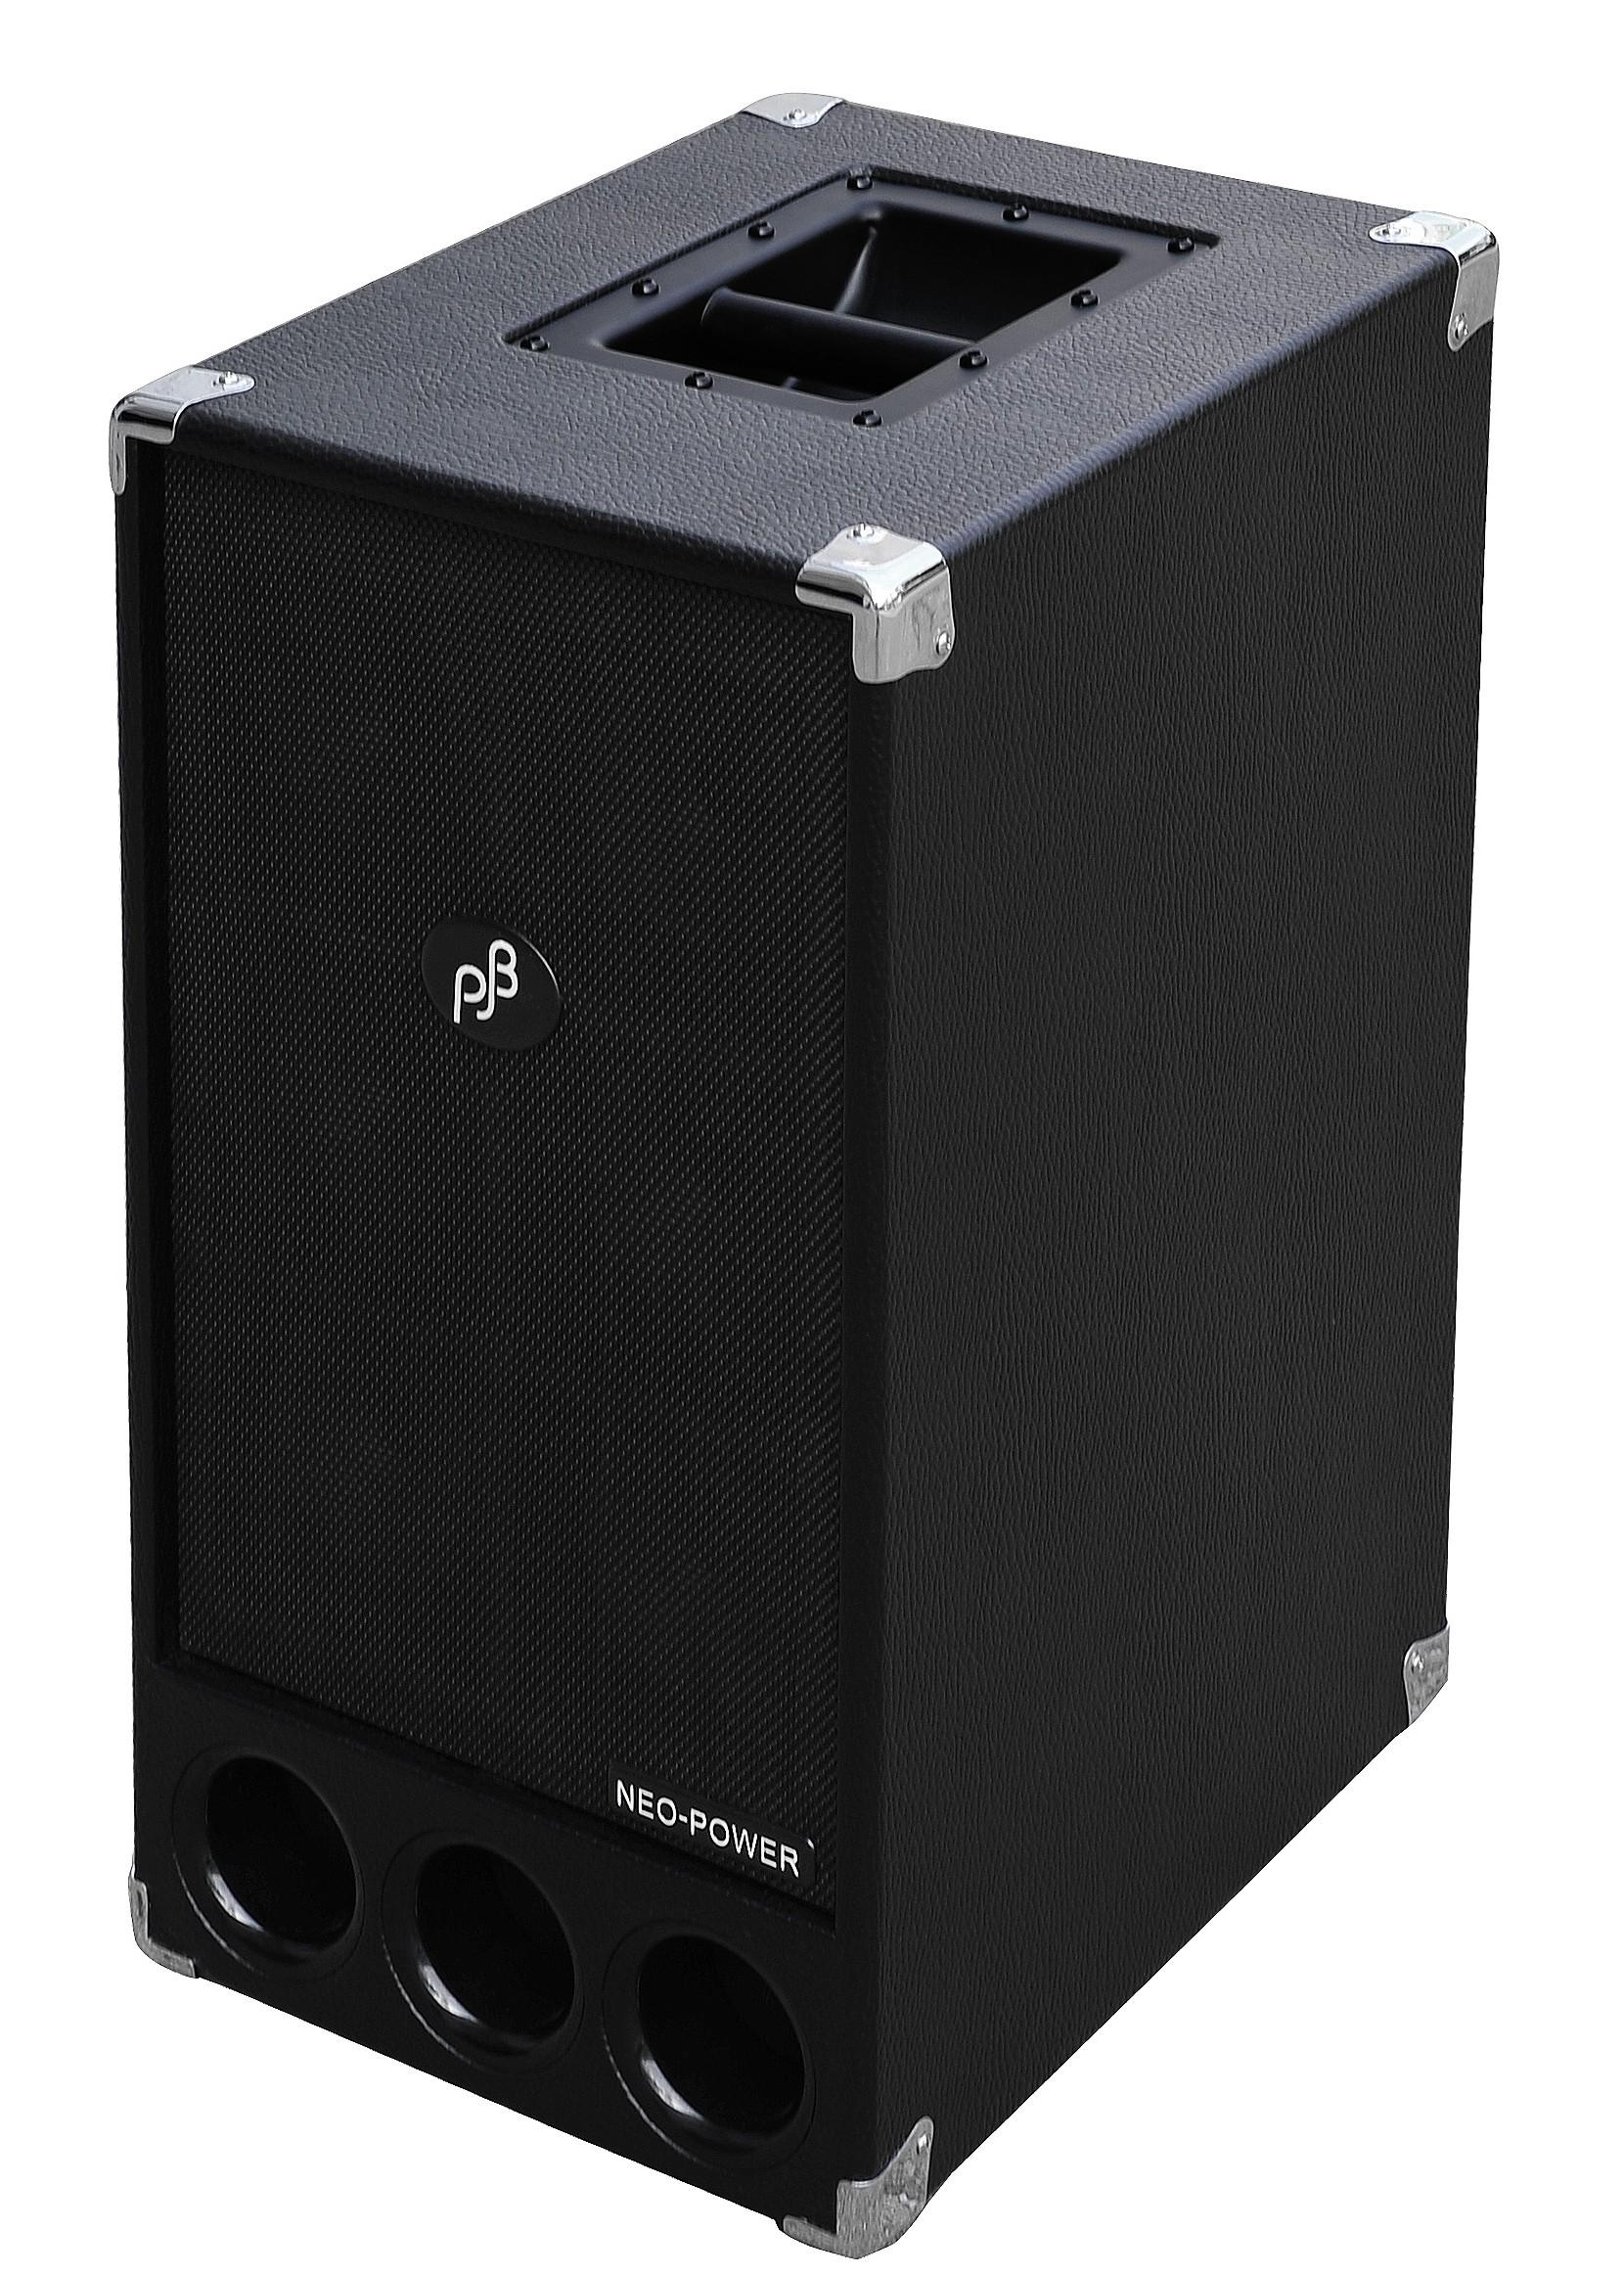 PB-300 Powered Cabinet – Phil Jones Bass